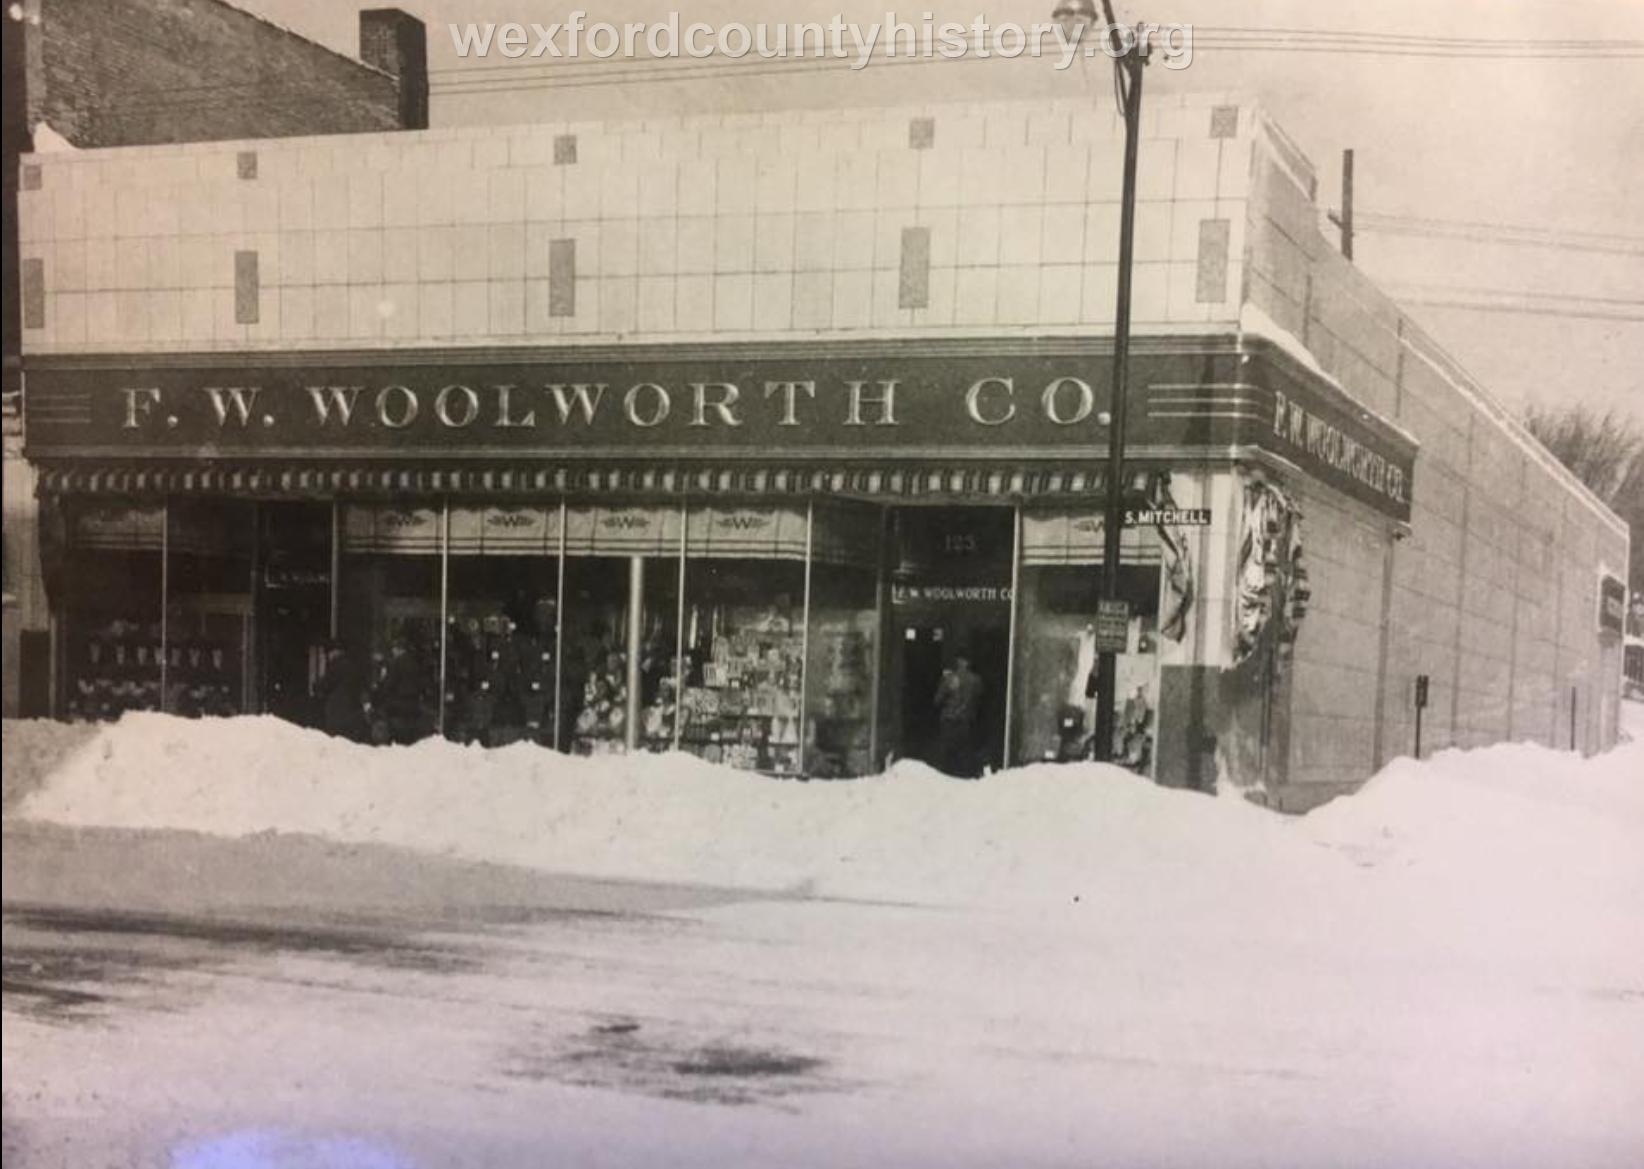 F. W. Woolworth Company